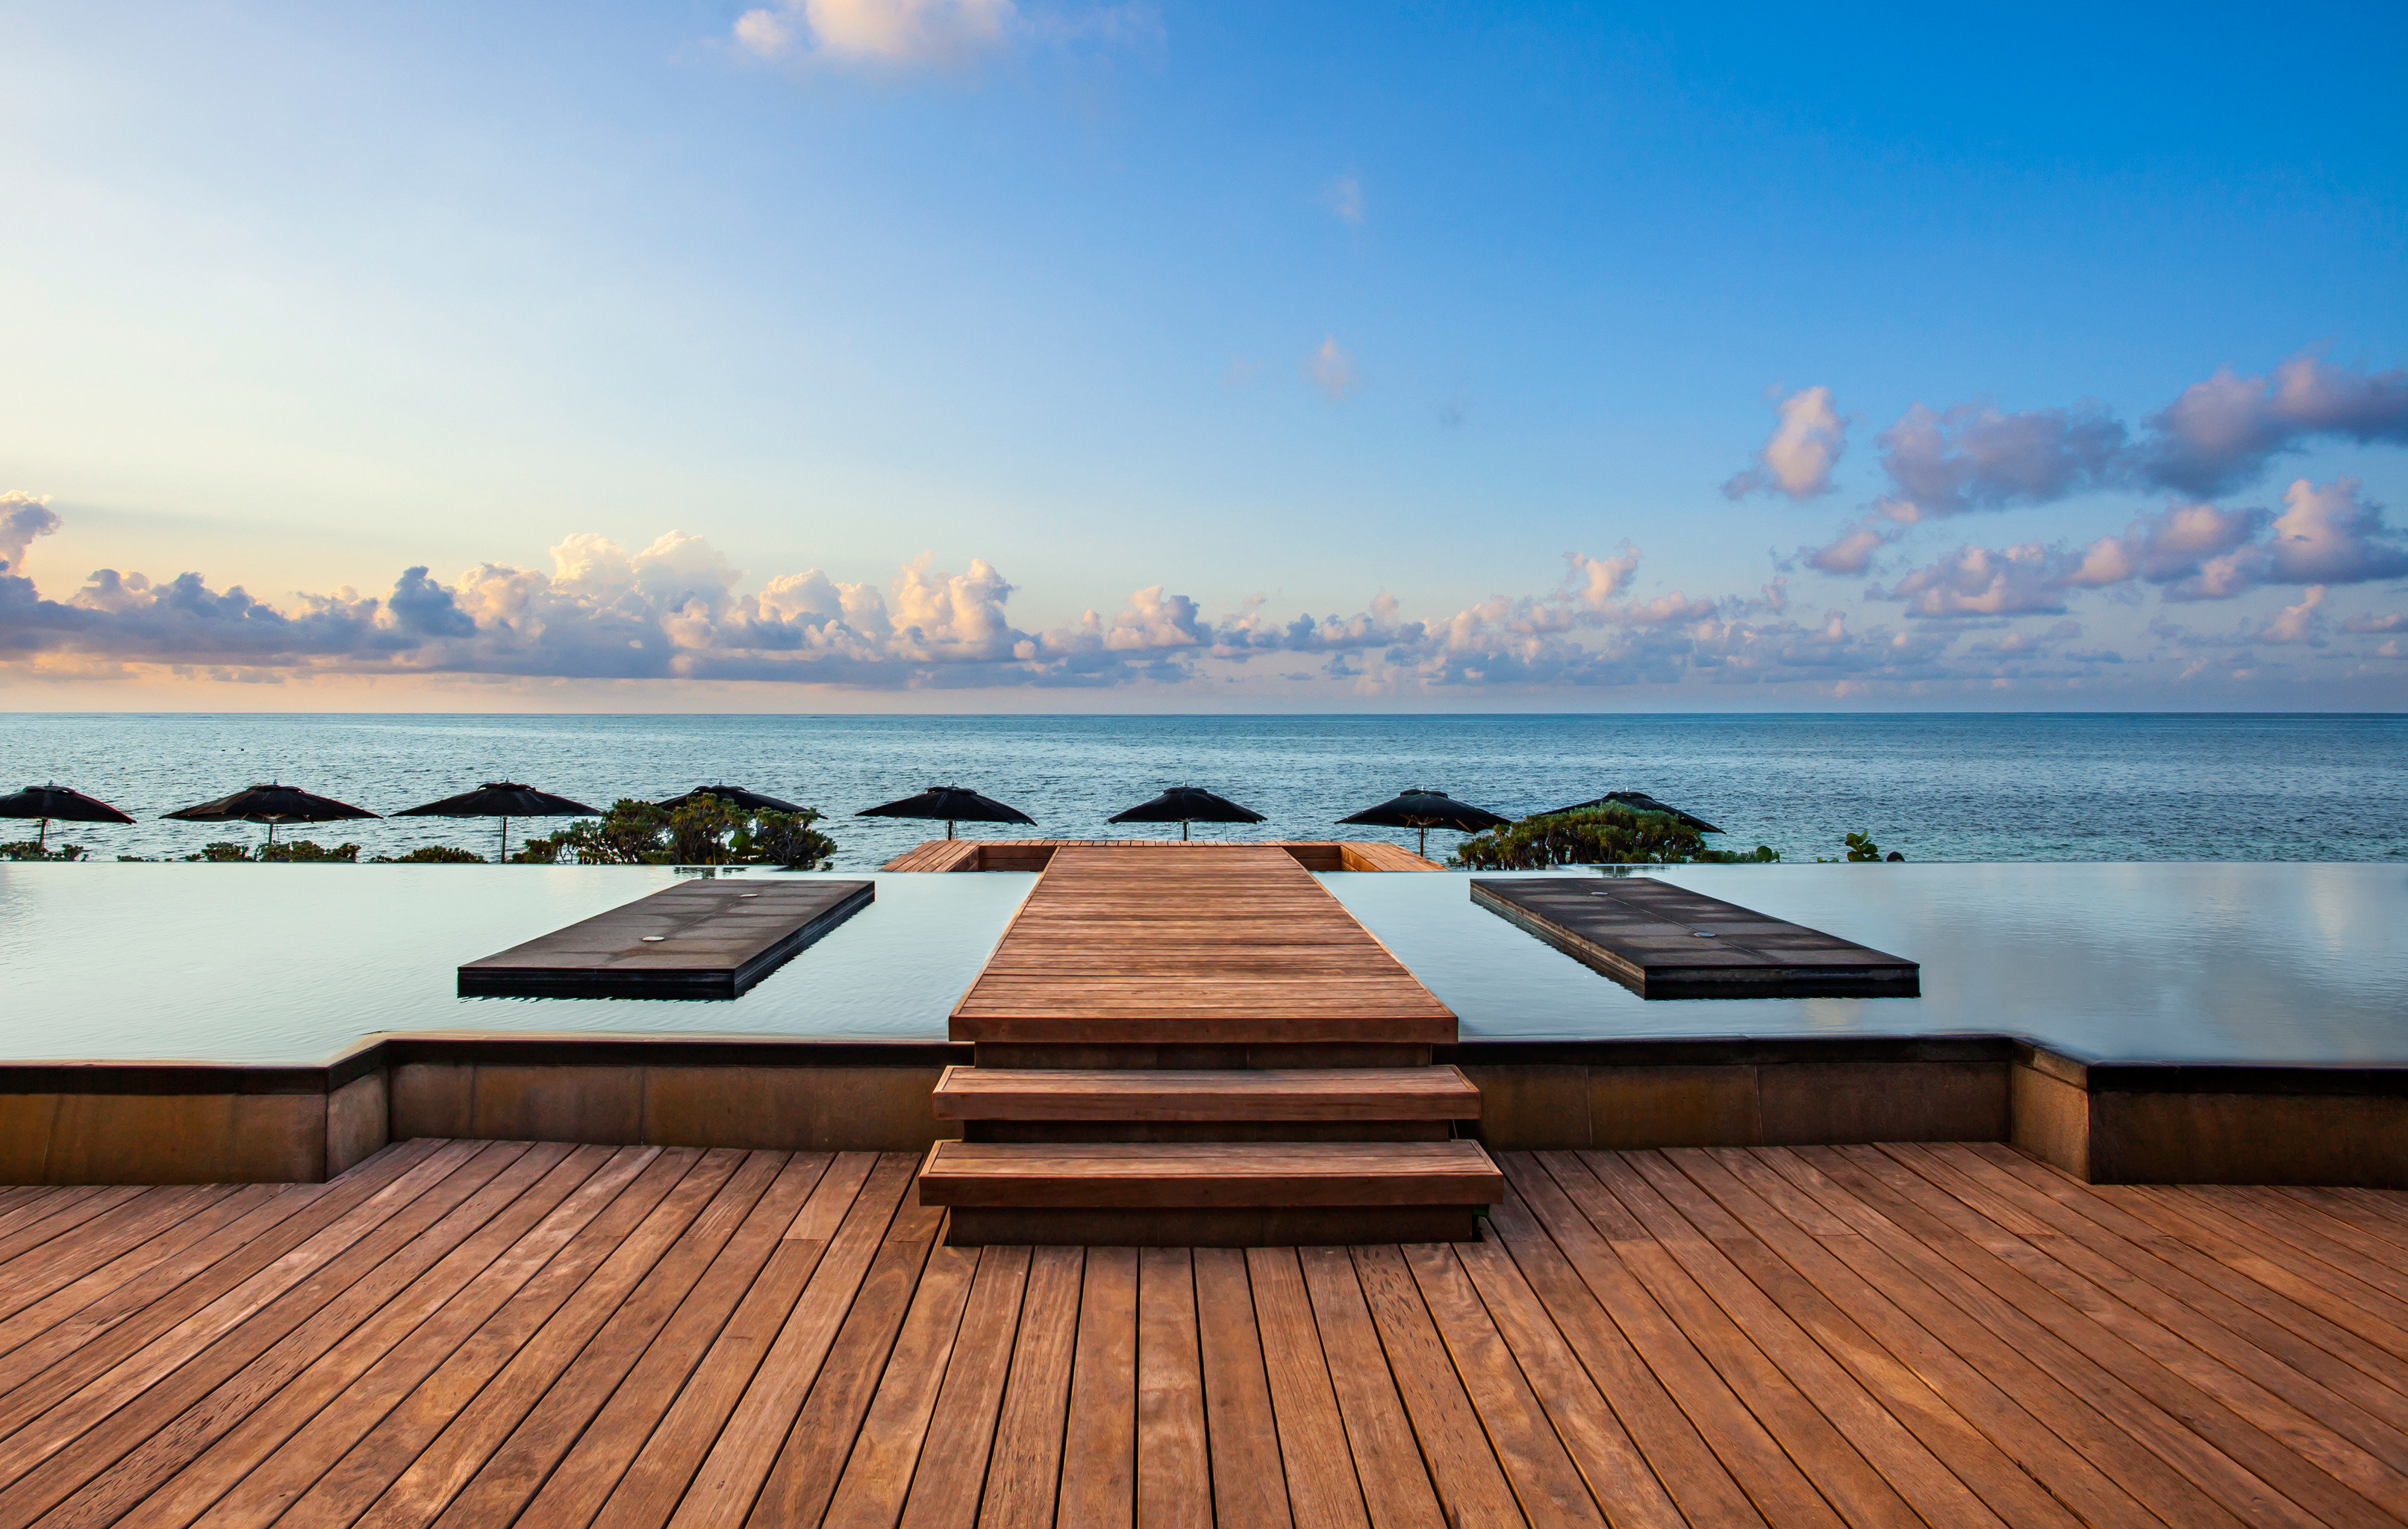 Beachfront Hotels Luxury News Pool Romance Trip Ideas Waterfront sky water Sea horizon wooden Ocean shore morning Sunset Beach swimming pool Coast dusk Deck overlooking